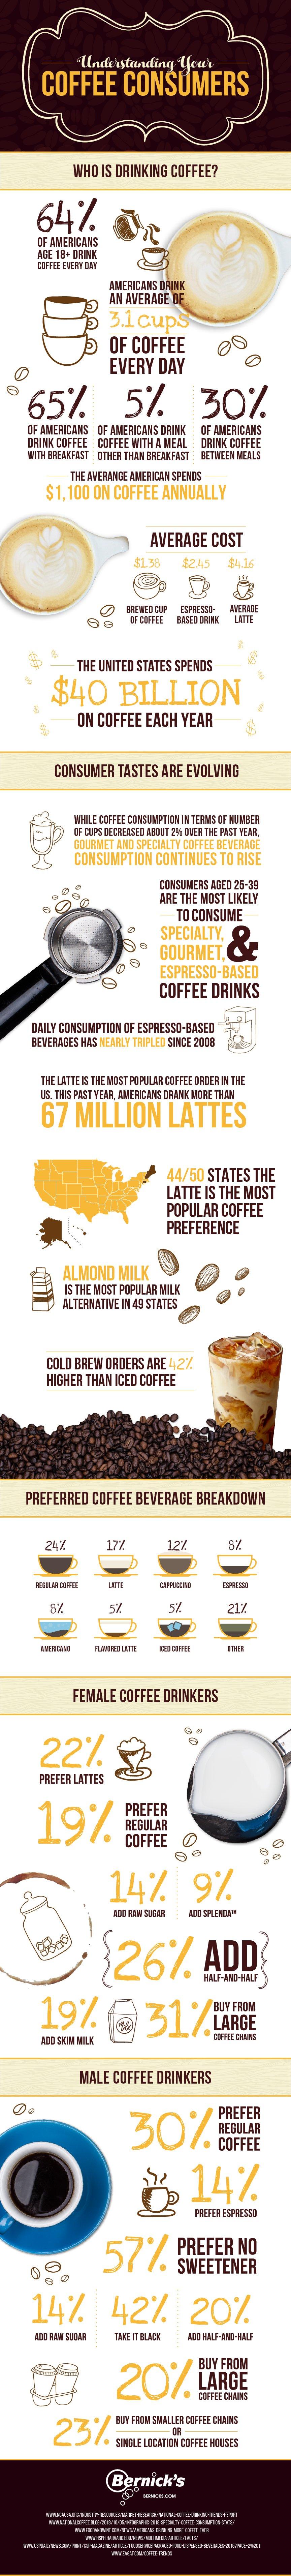 Illustrated infographic of coffee statistics